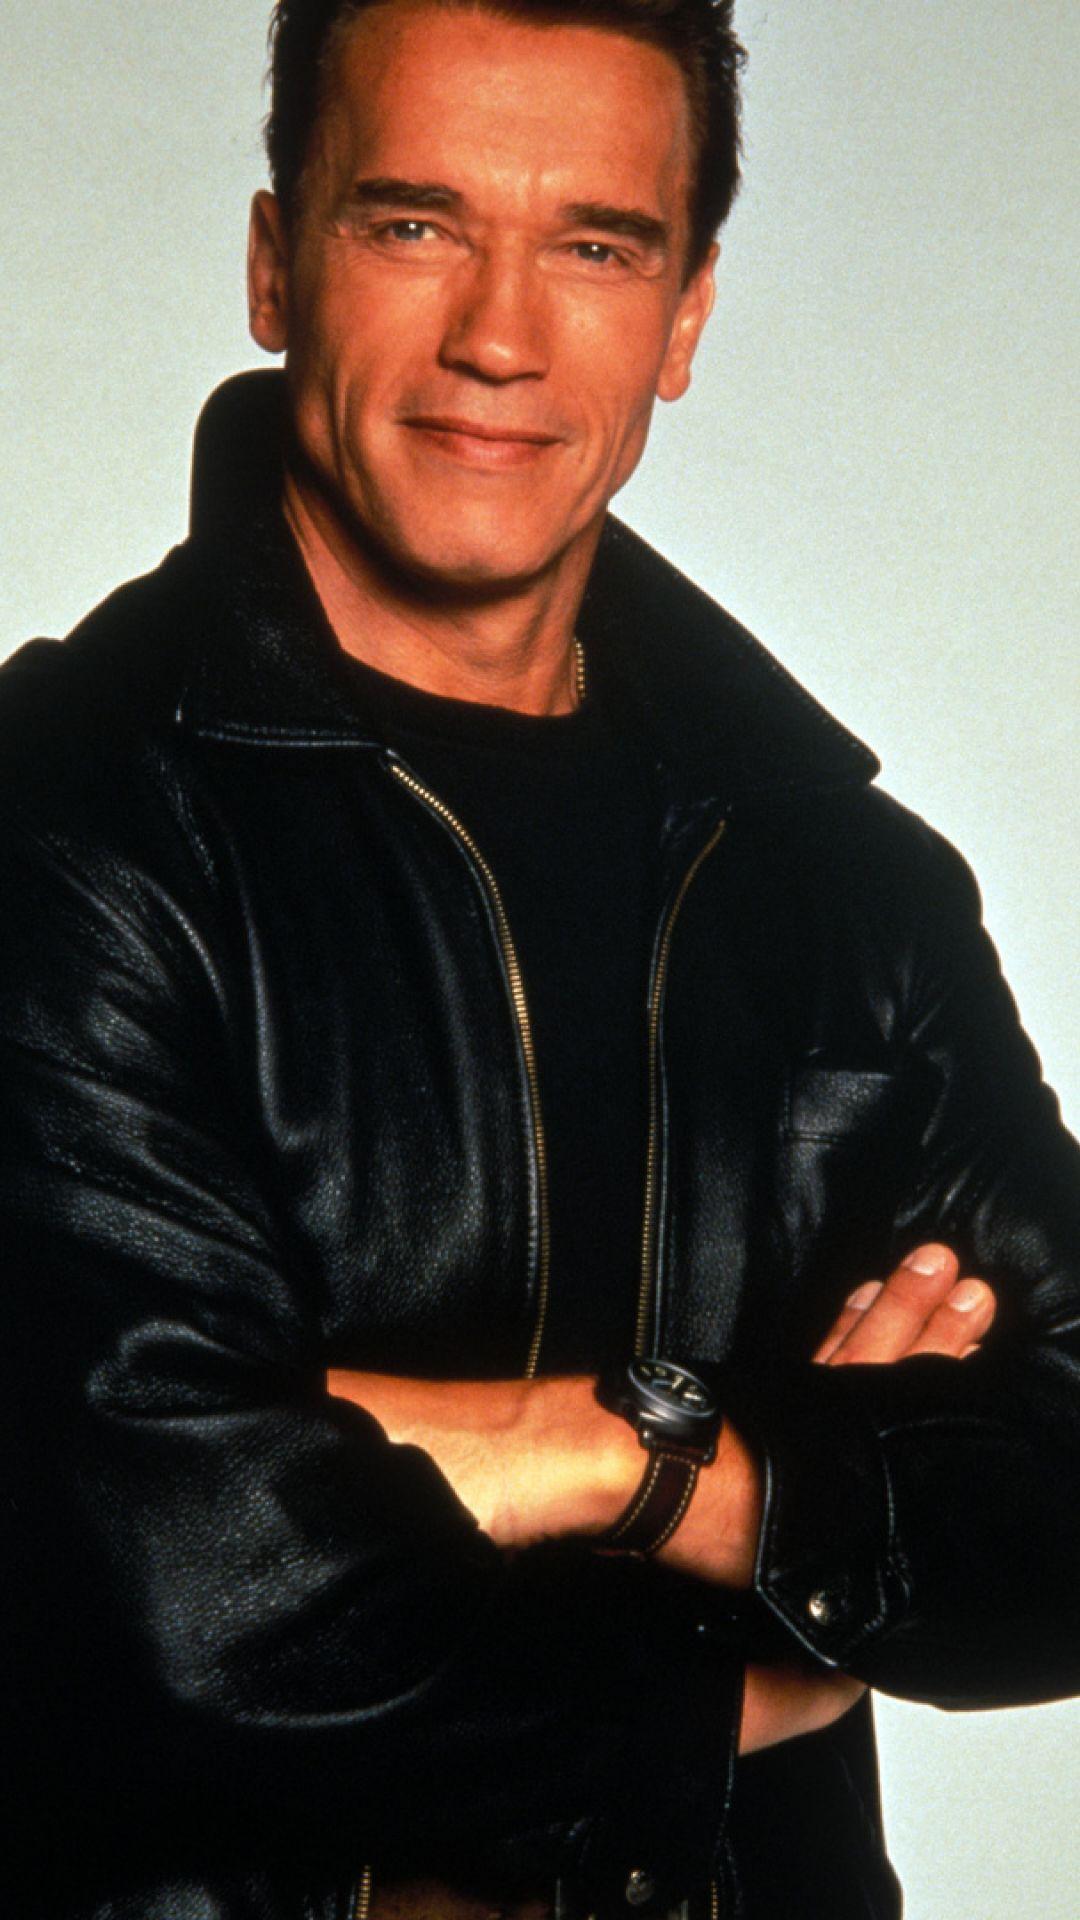 Download, Arnold Schwarzenegger Iphone Wallpaper Free